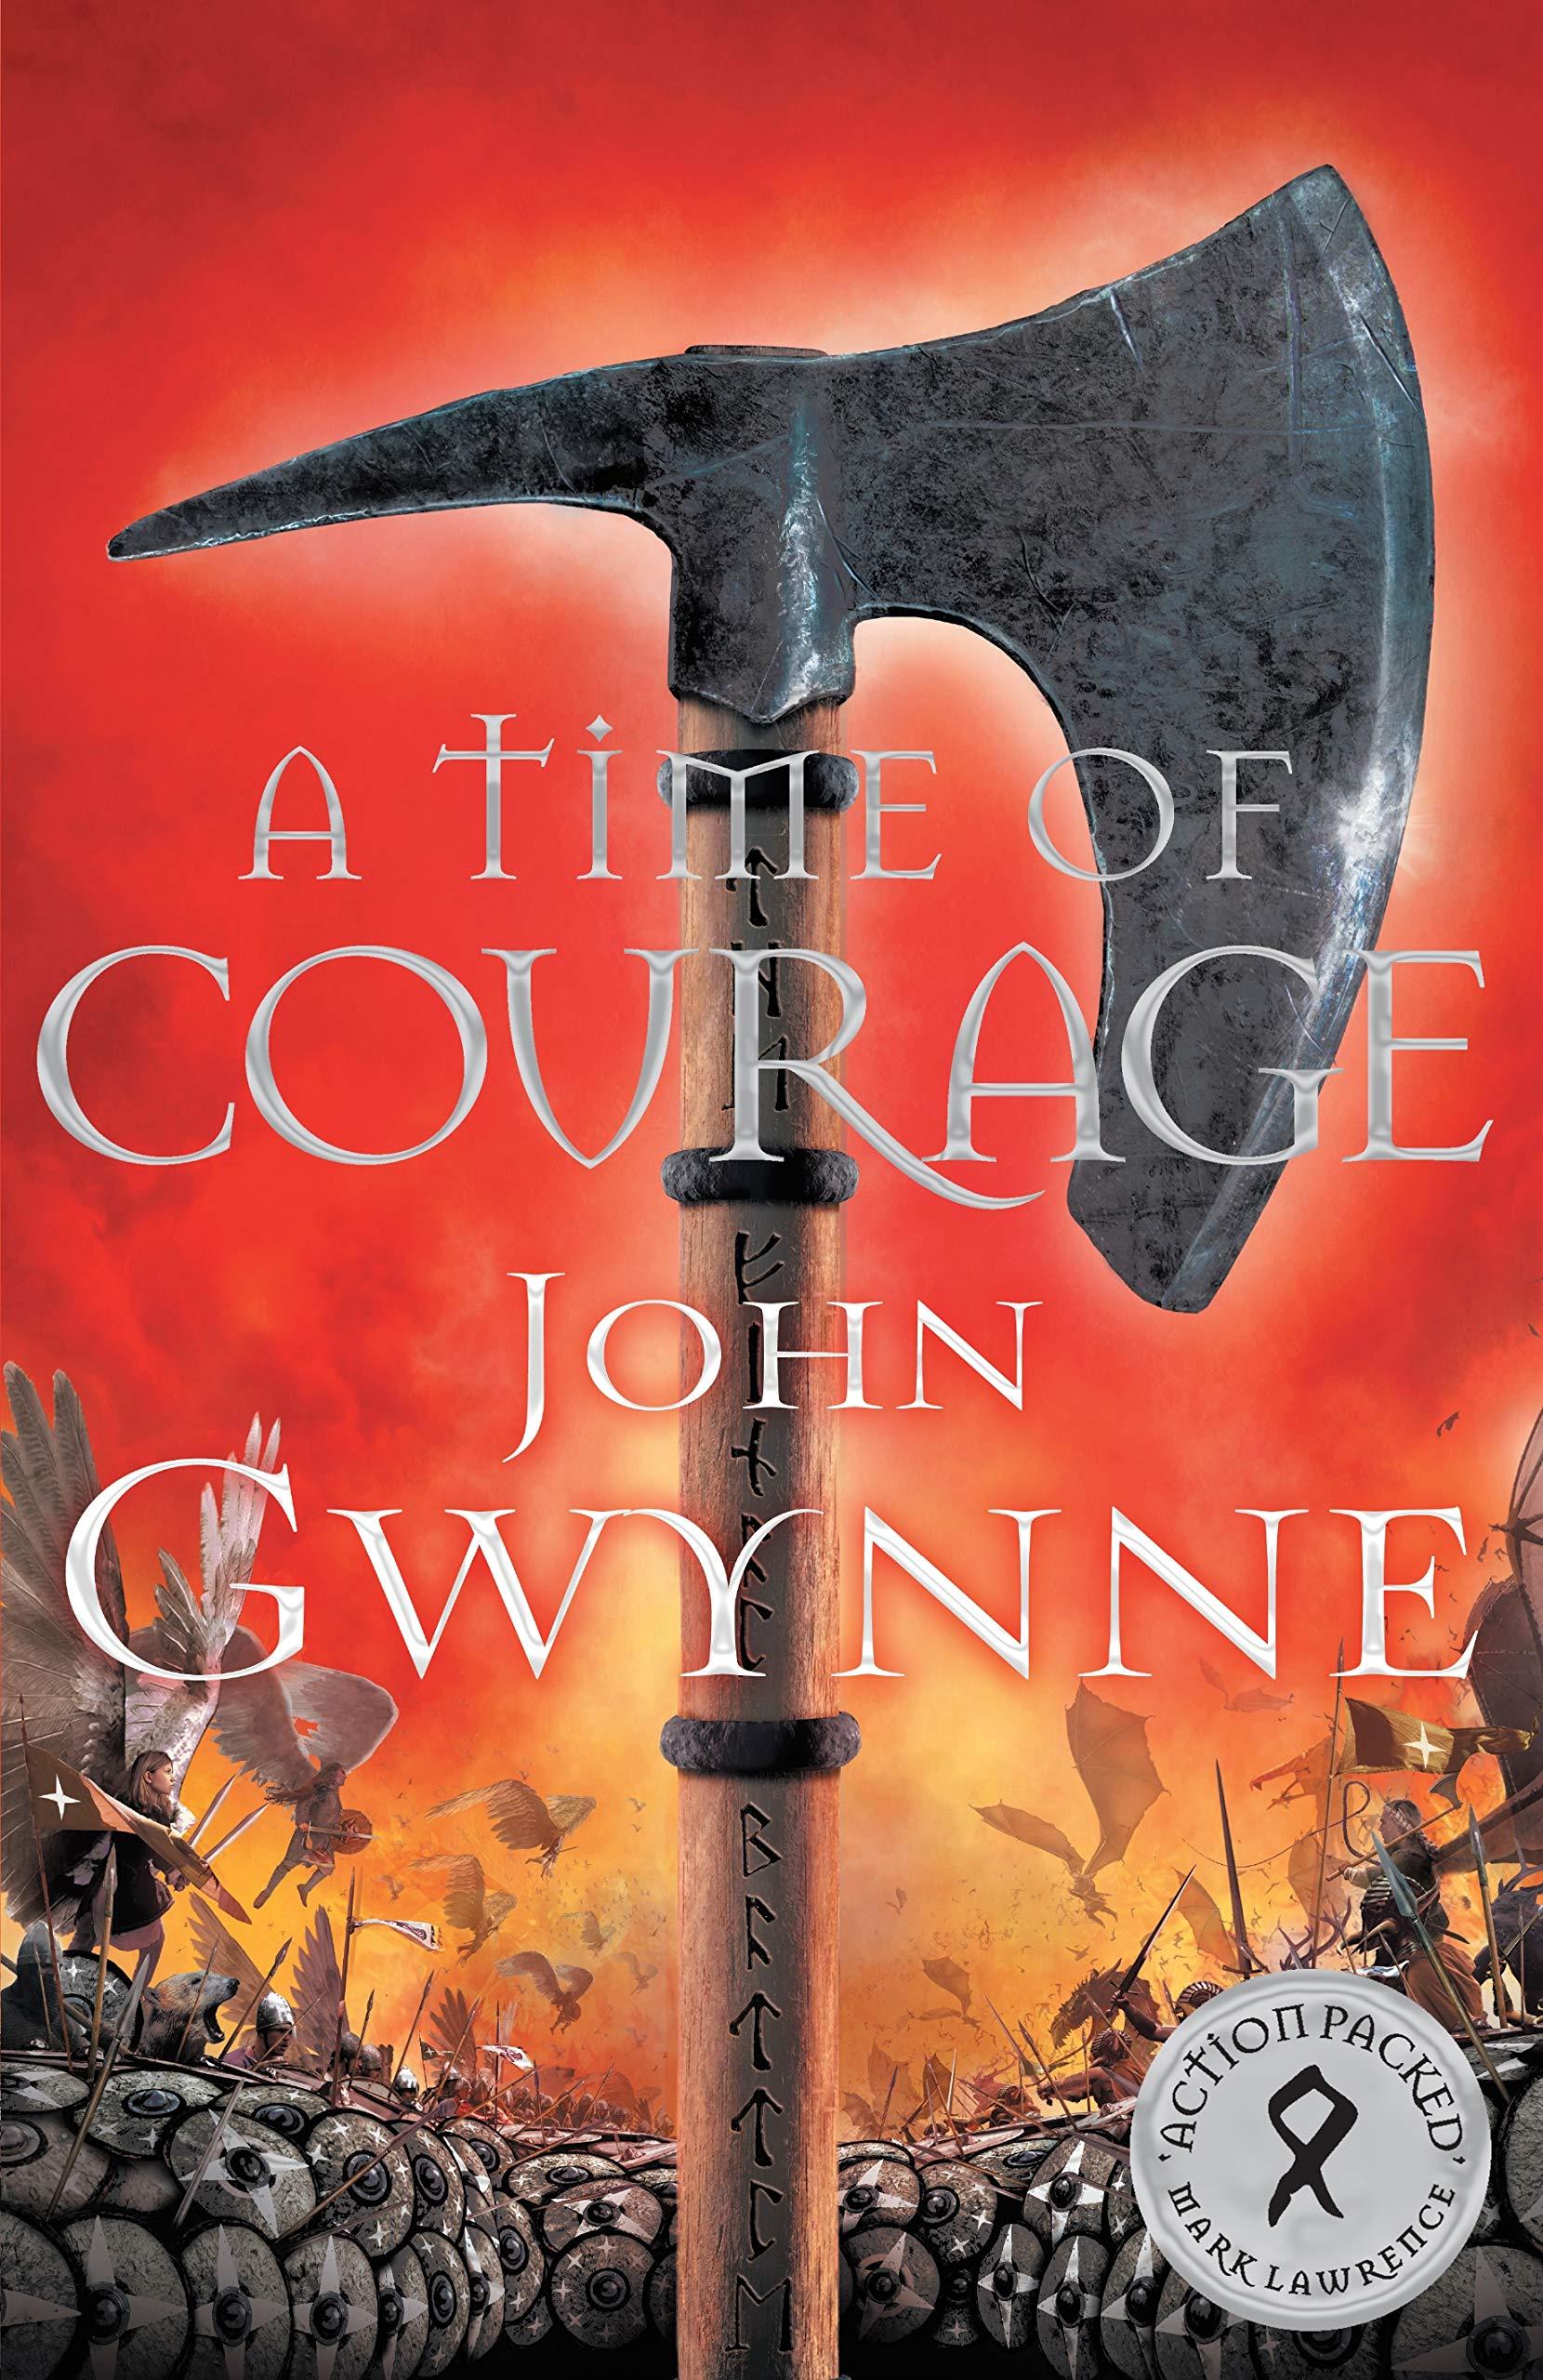 A Time of Courage (Of Blood and Bone): Amazon.co.uk: Gwynne, John:  9781509813025: Books